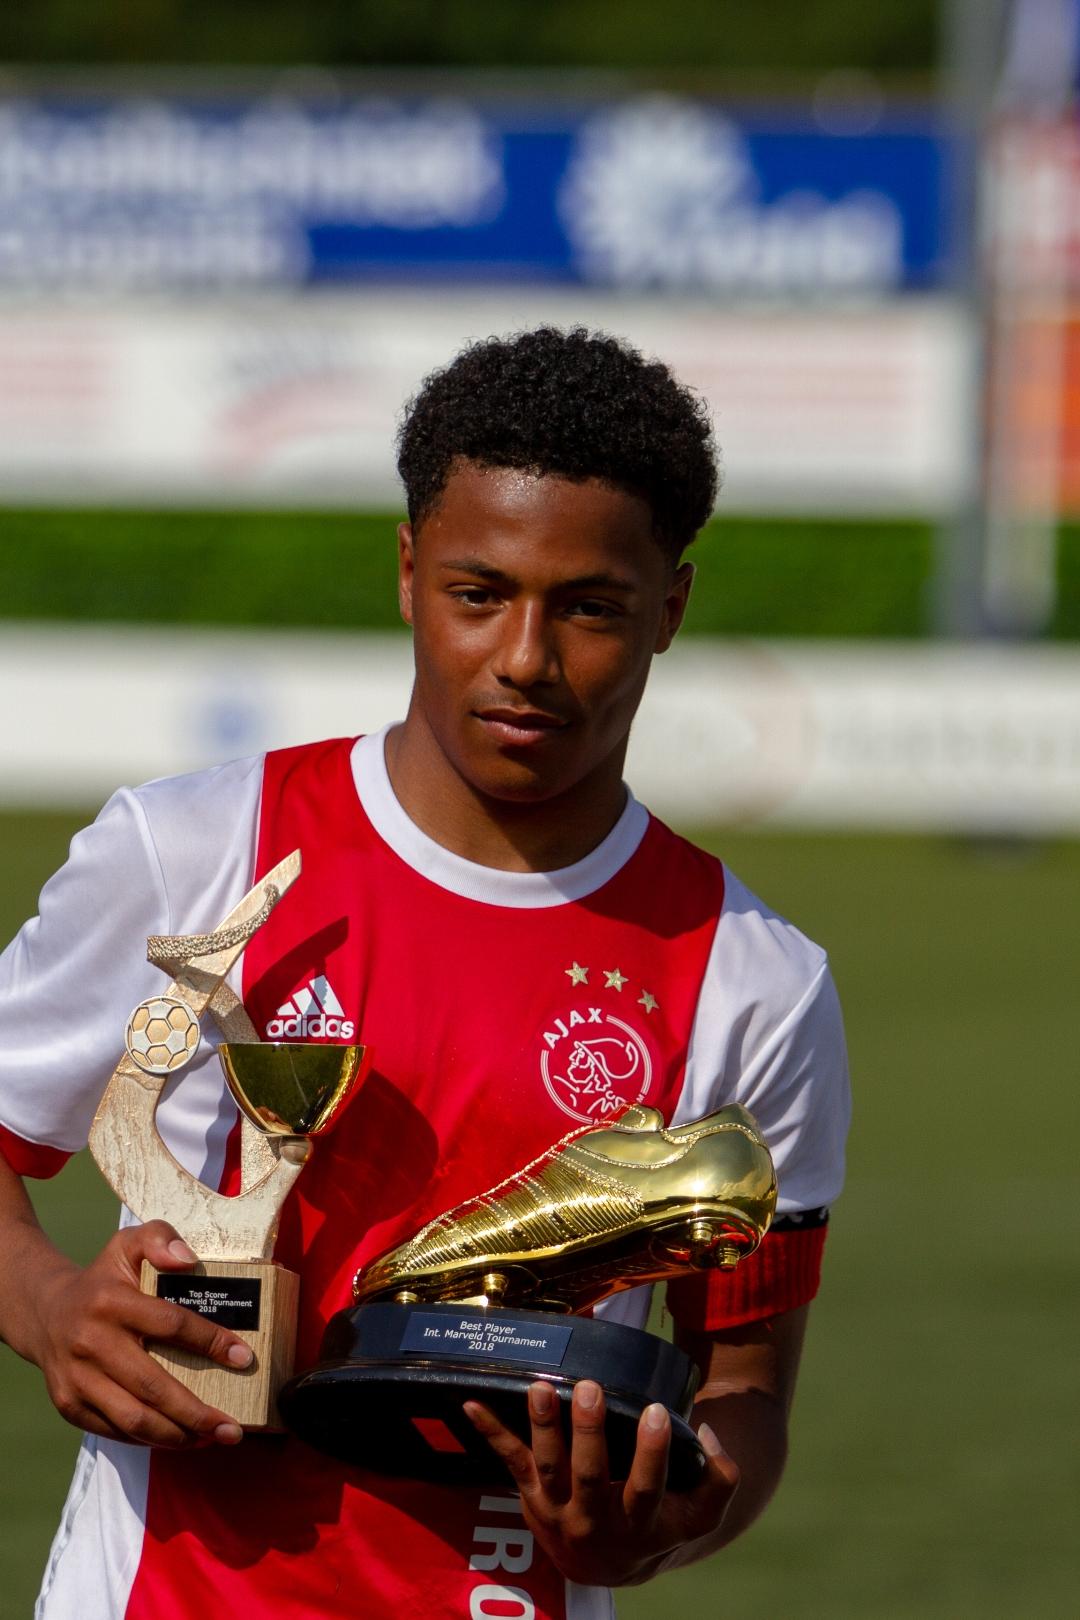 Marveld Tournament 2018 - Best Player And Topscorer Dillon Hoogewerf of Ajax